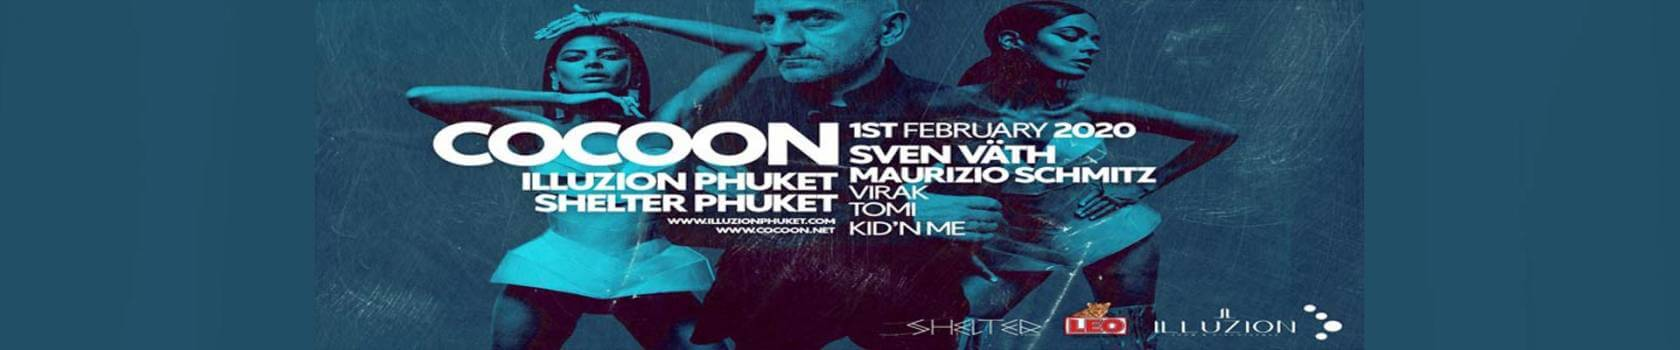 Cocoon Phuket w/ Sven Väth, Maurizio Schmitz and many more